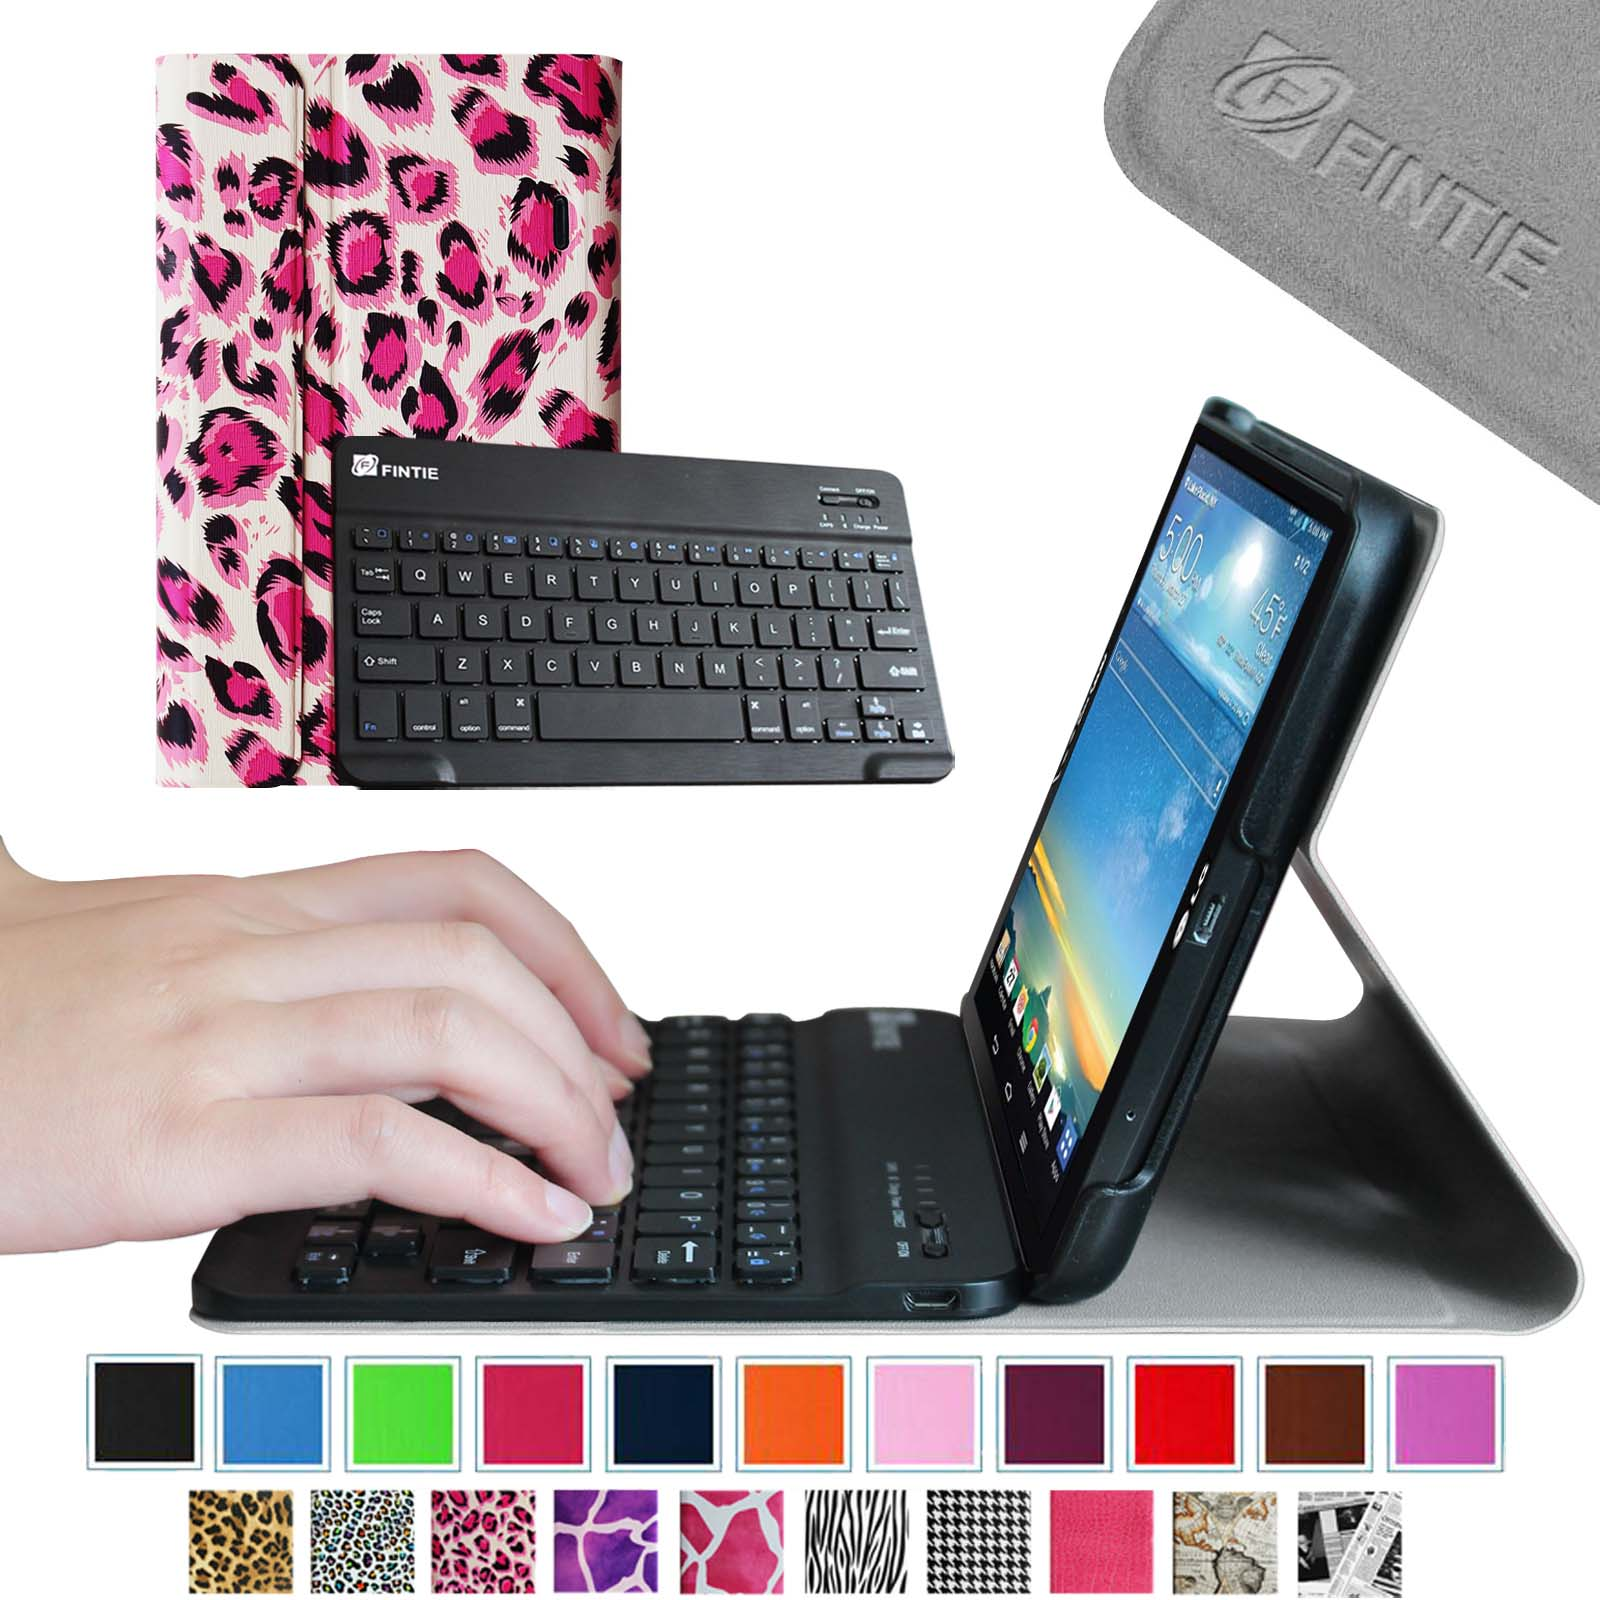 Fintie Wireless Bluetooth Keyboard Case for LG G PAD 8 3 Model V500/V510  (Wifi)&VK810 (Verizon 4G LTE), Leopard Magenta